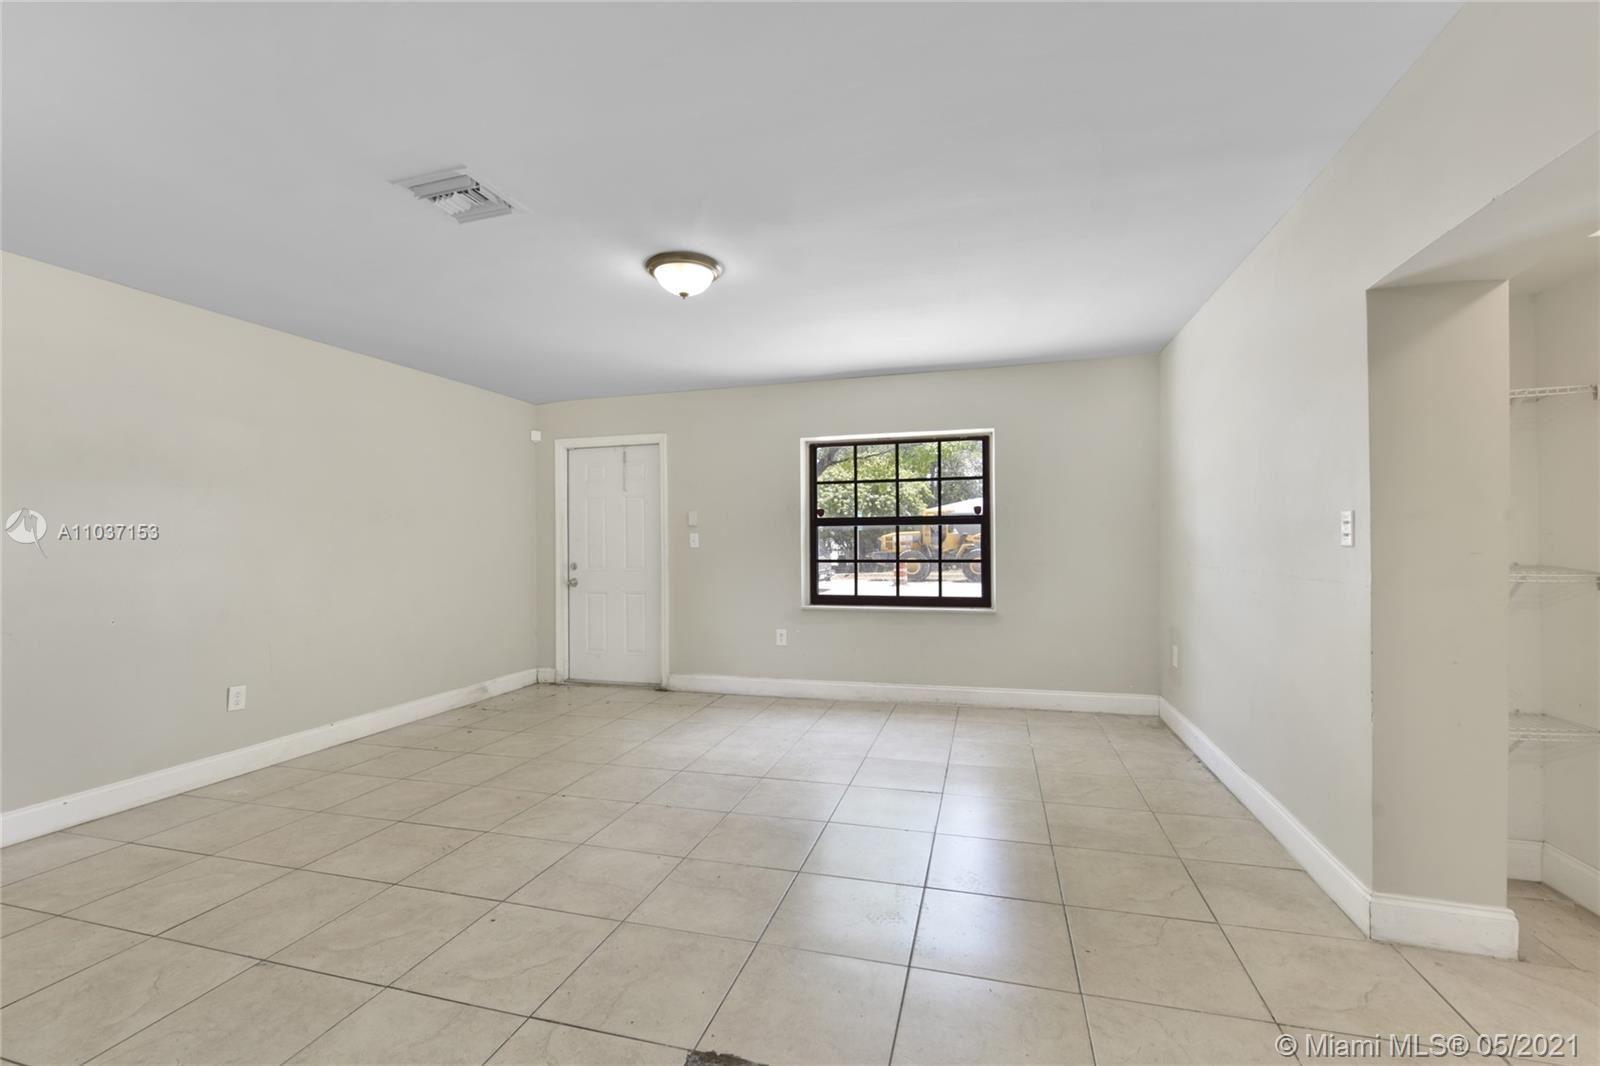 Photo of 305 NW 135th St, North Miami, FL 33168 (MLS # A11037153)